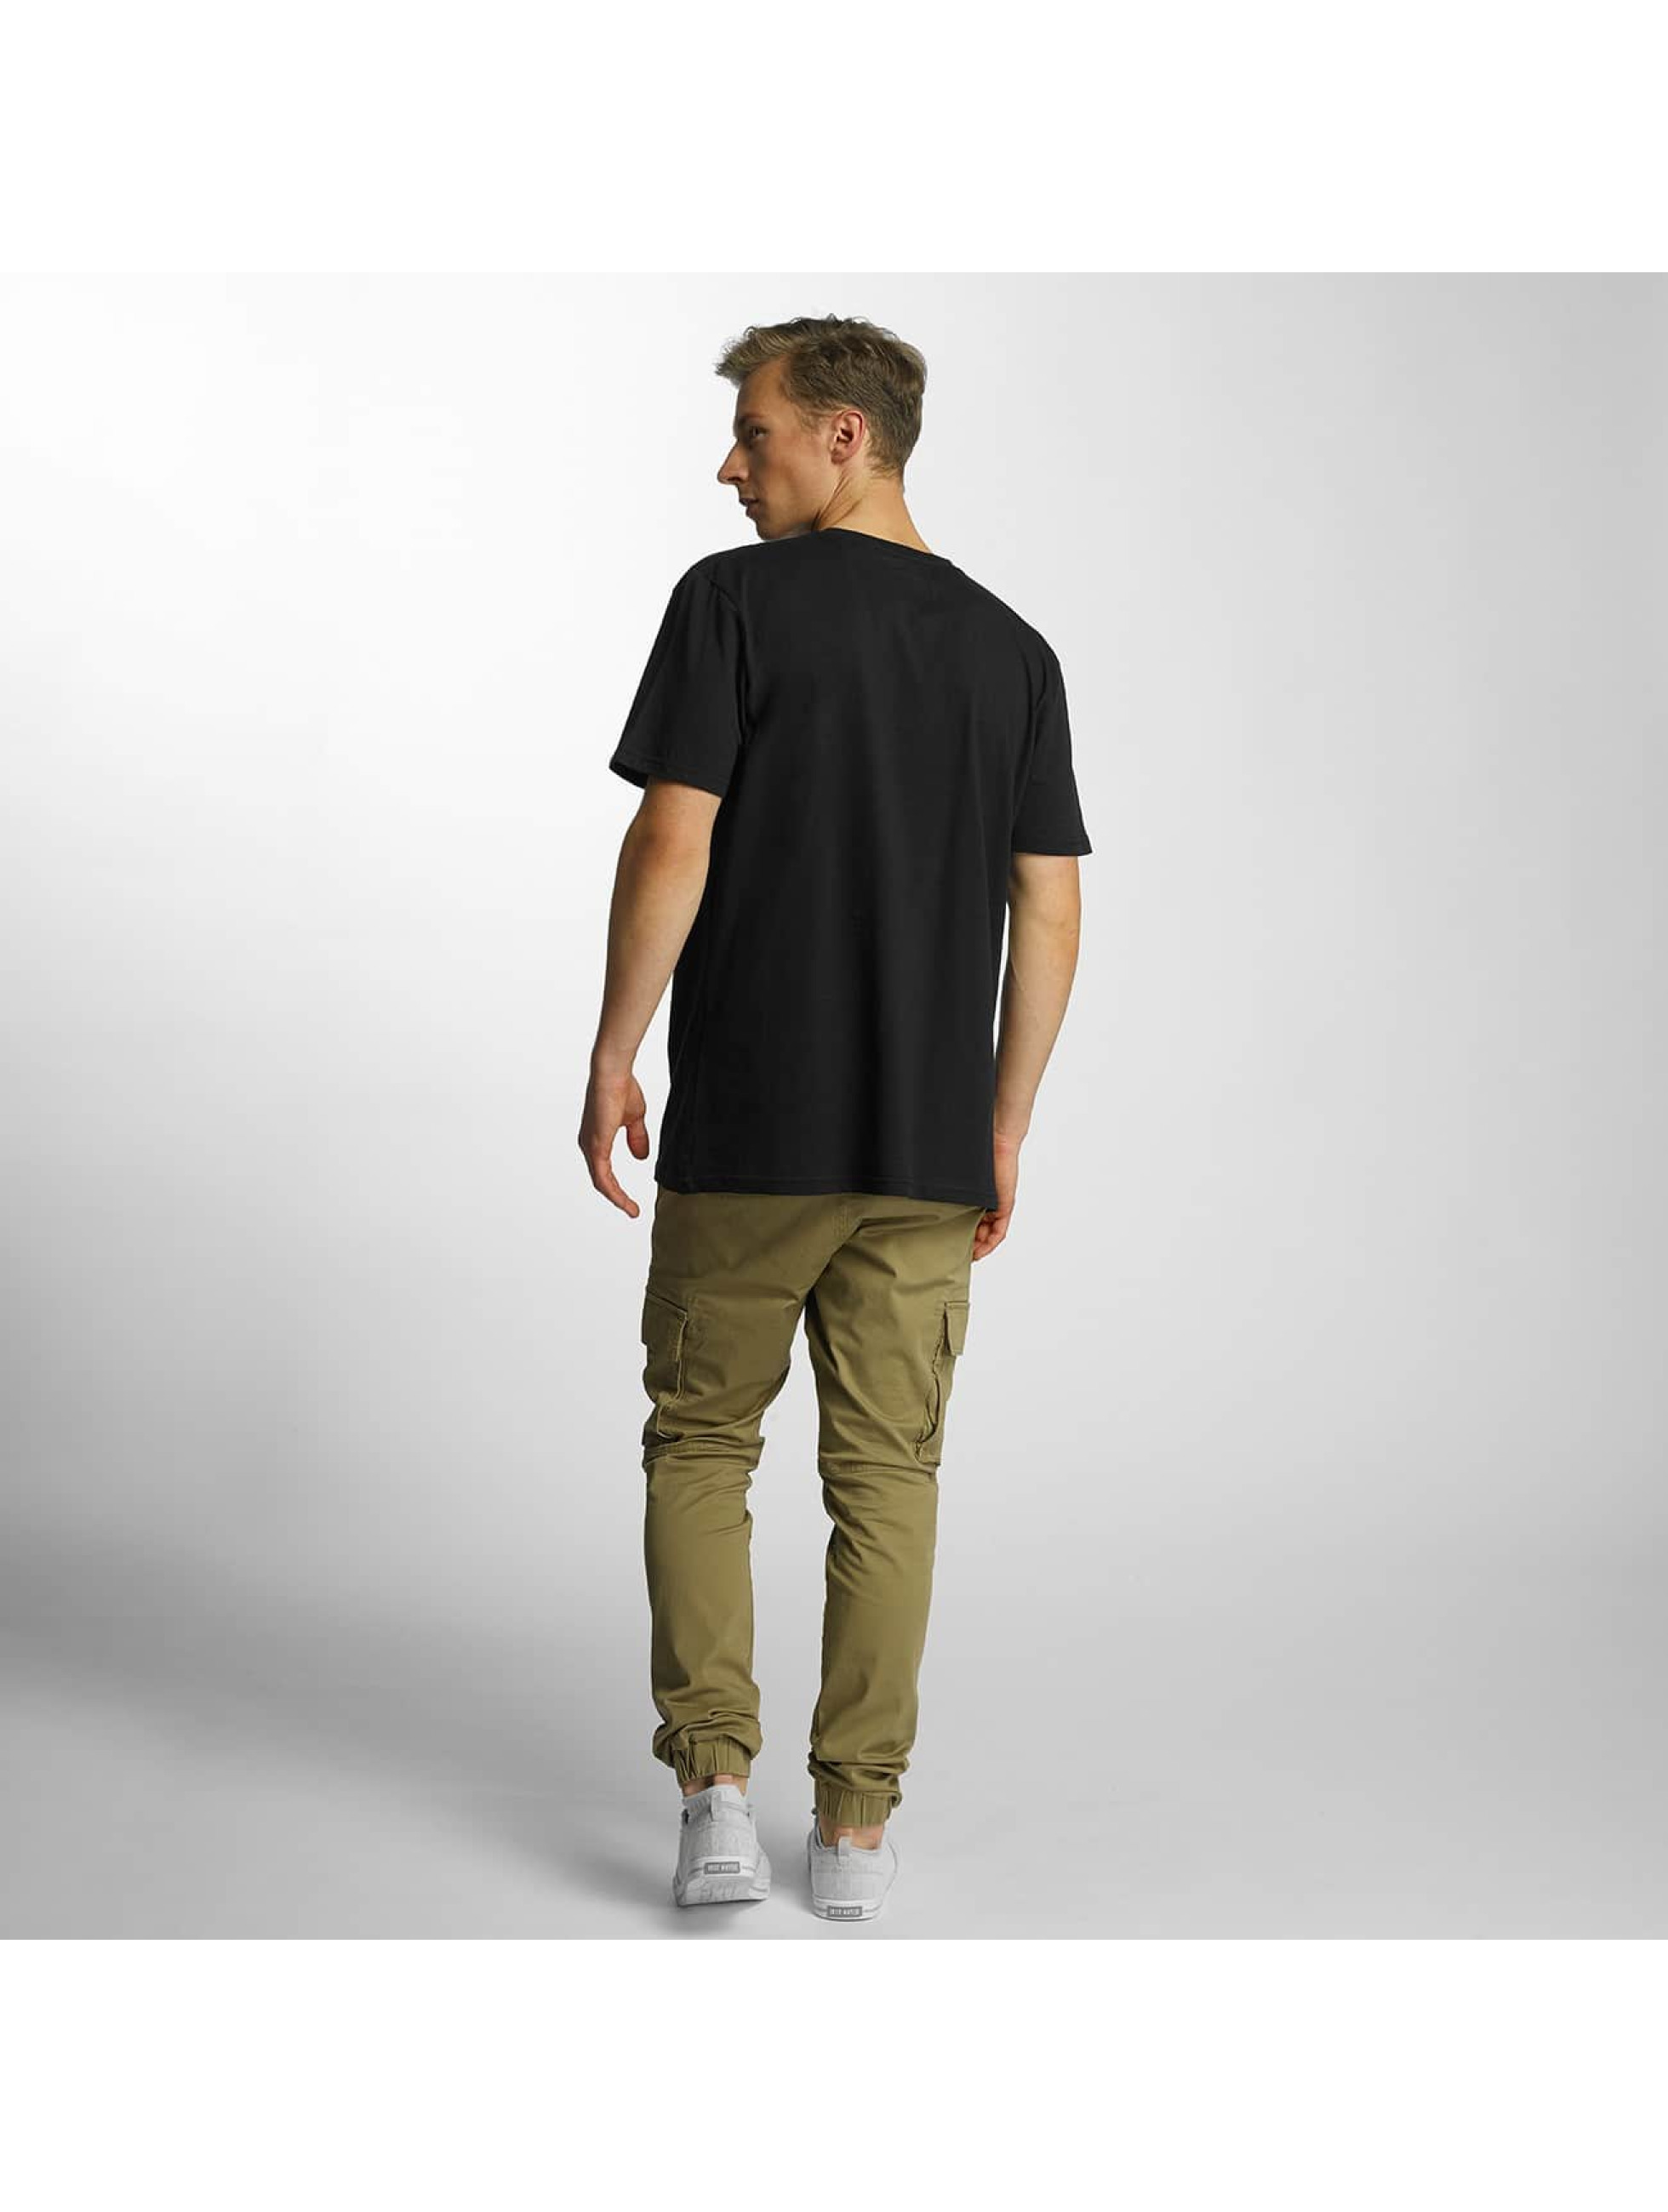 Quiksilver T-Shirt Classic Sea Tales black